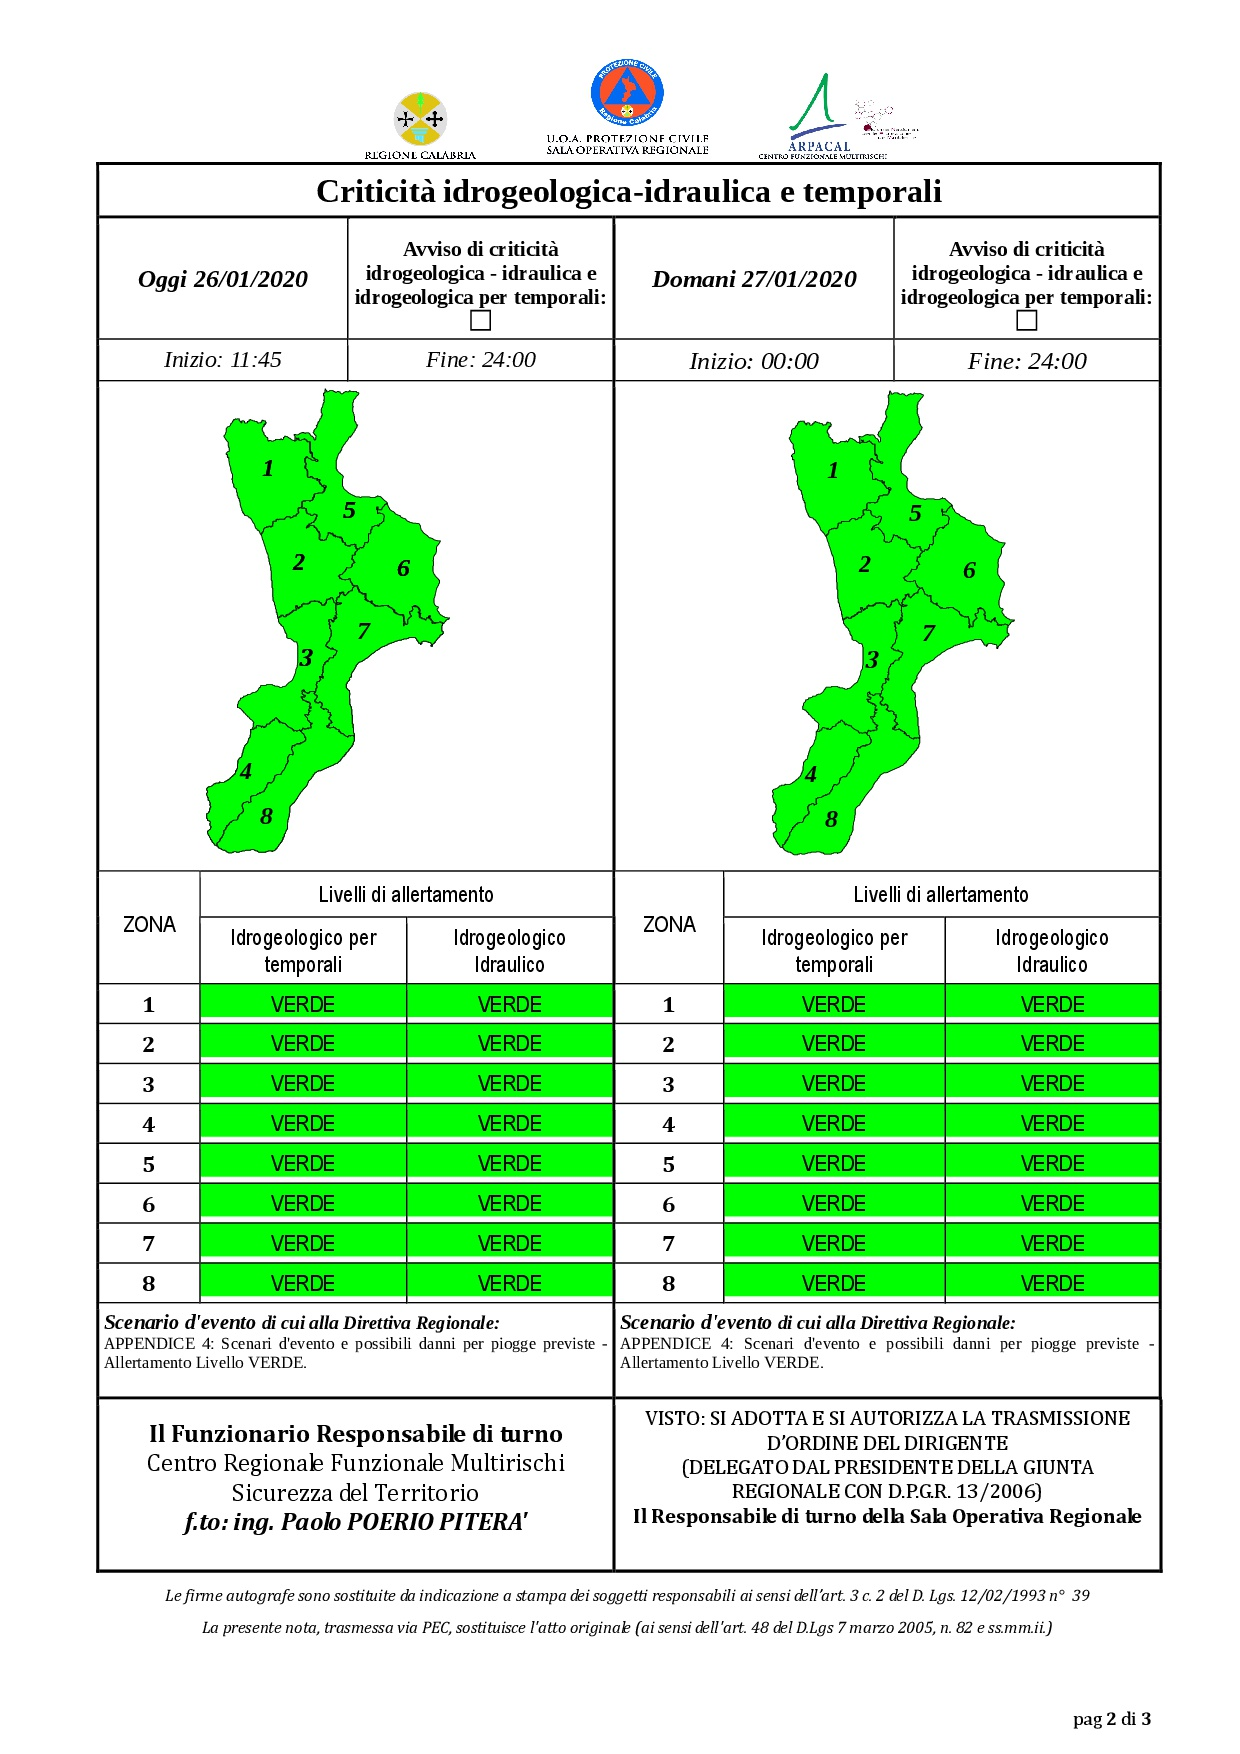 Criticità idrogeologica-idraulica e temporali in Calabria 26-01-2020